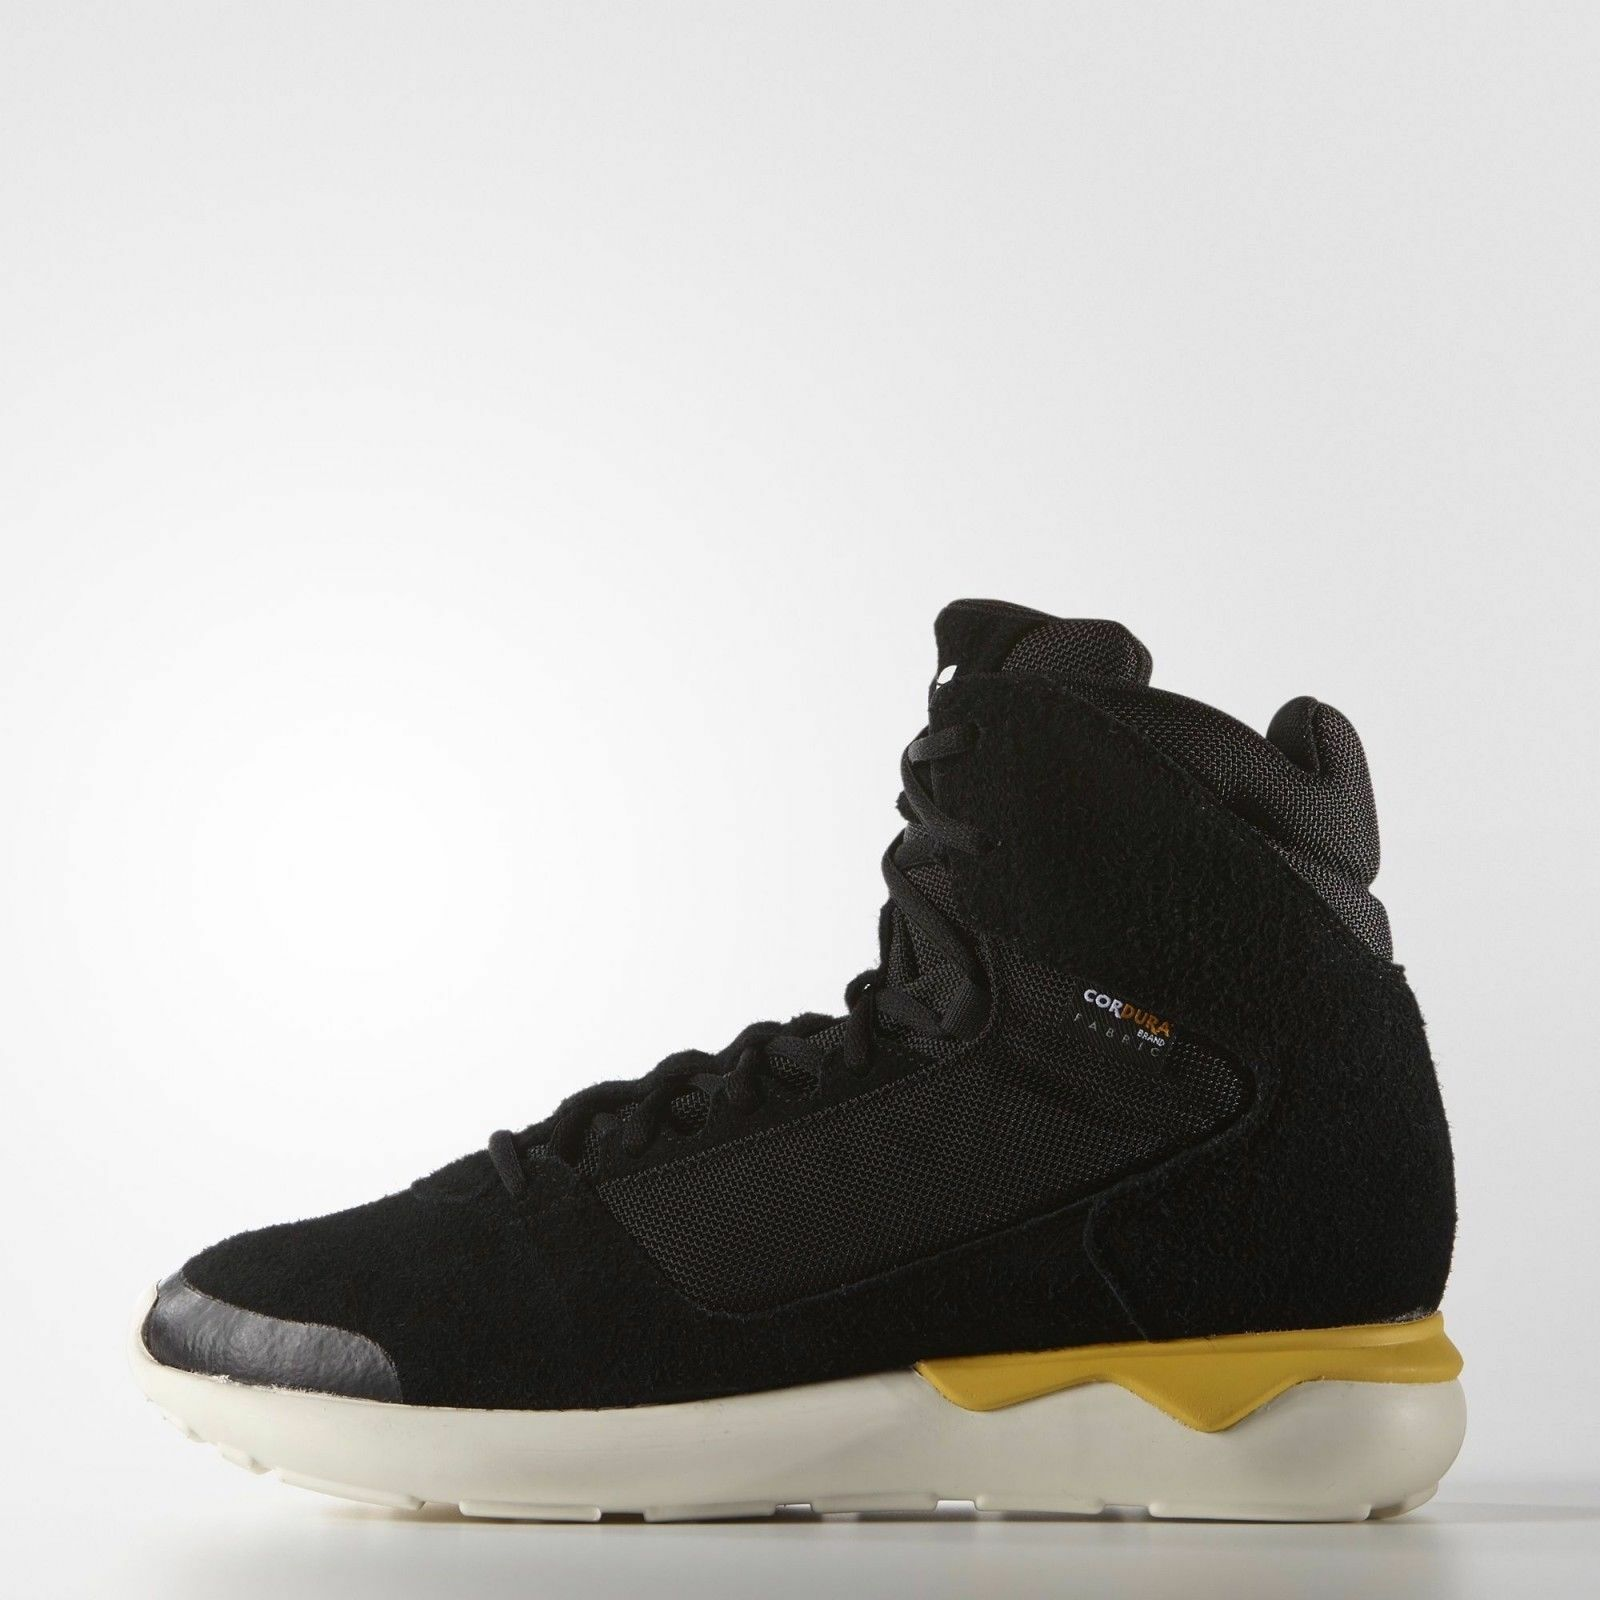 adidas Tubular GSG9 Sizes 5.5-10.5 Black RRP £110 BNIB S82516 RARE